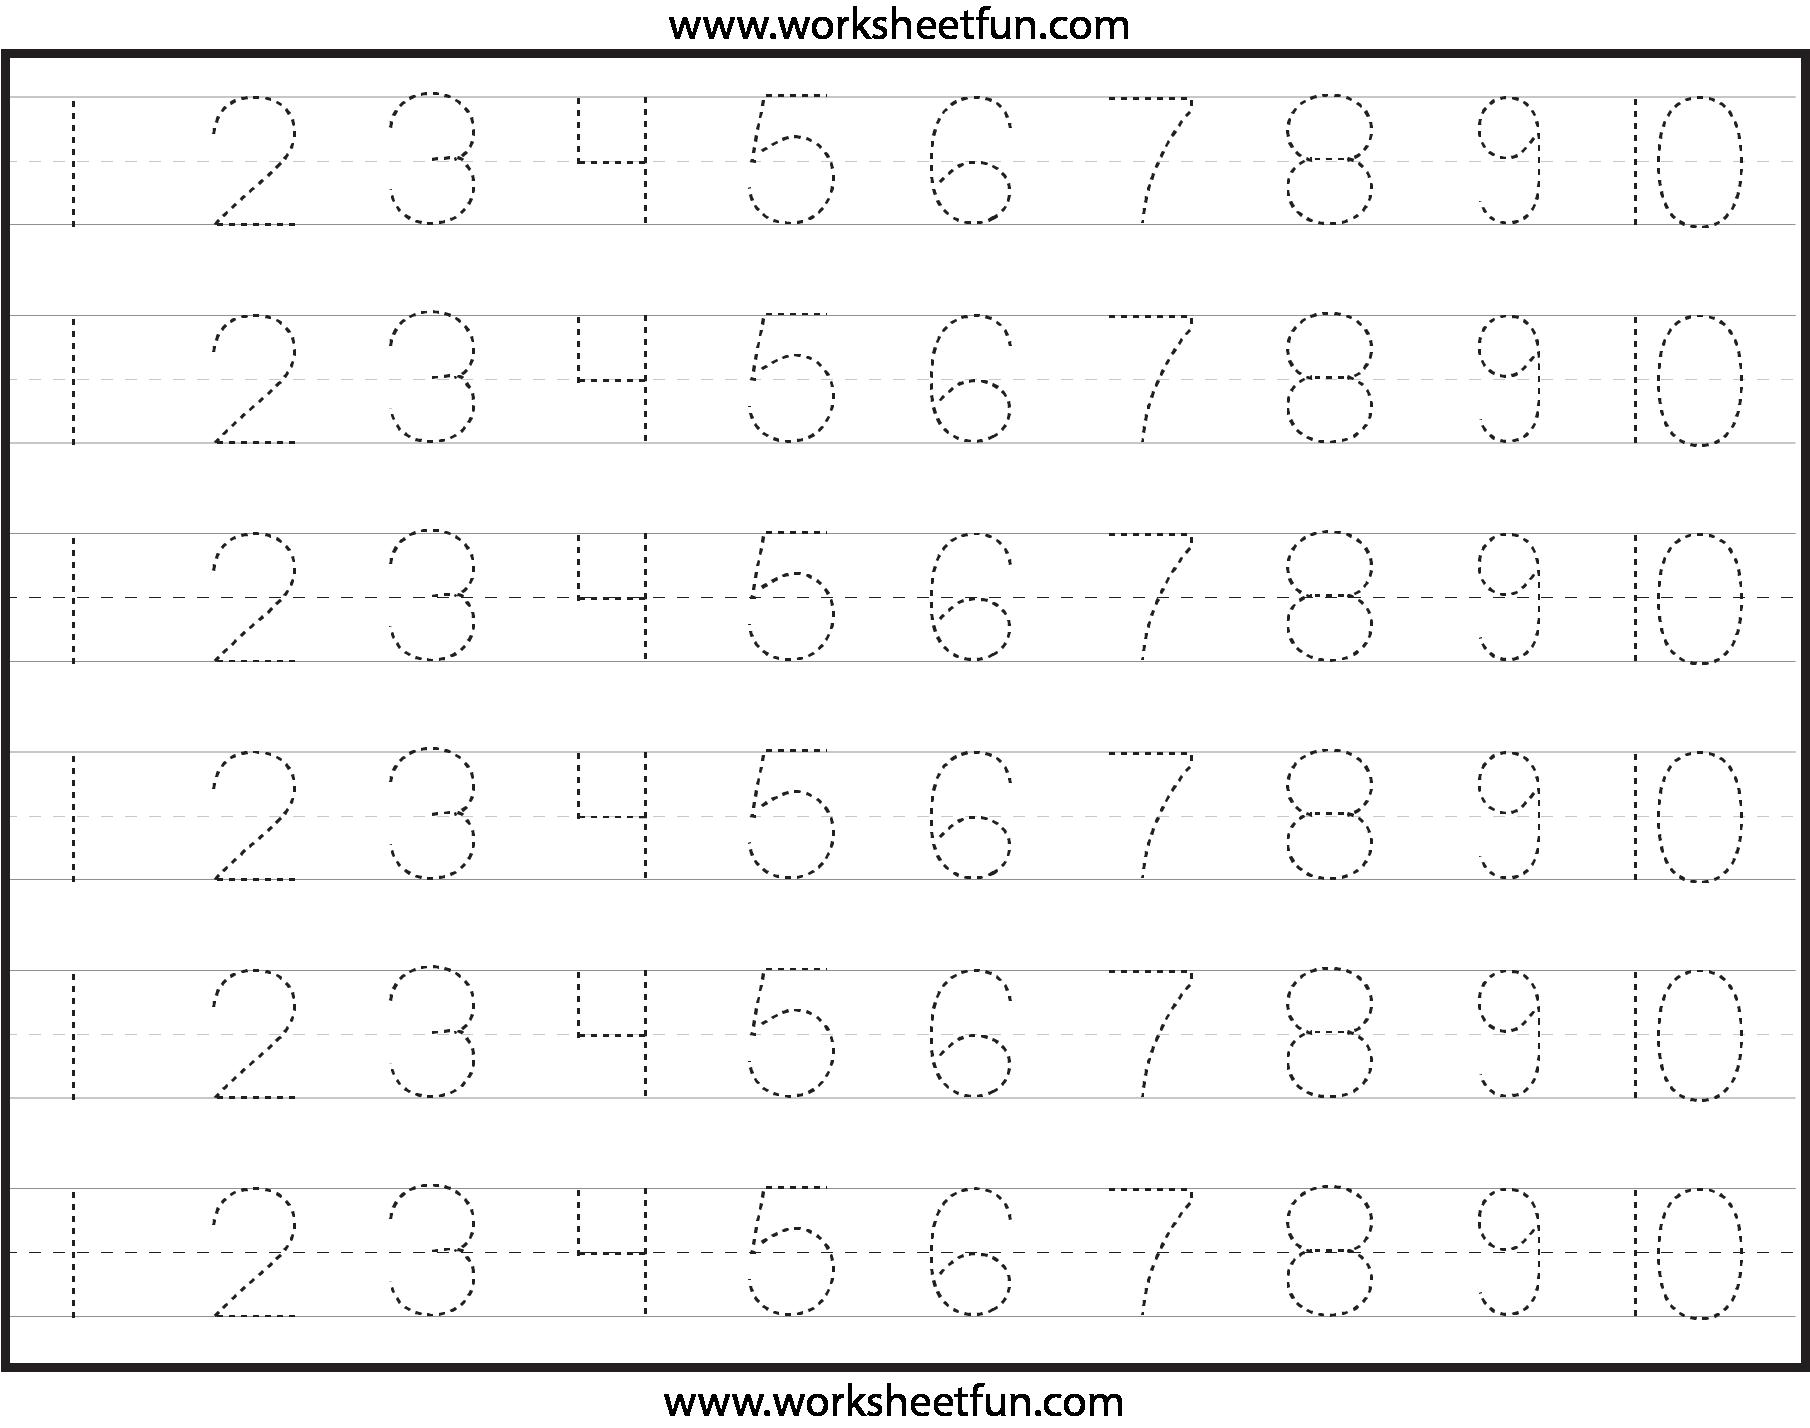 123 Worksheets. Lesupercoin Printables Worksheets